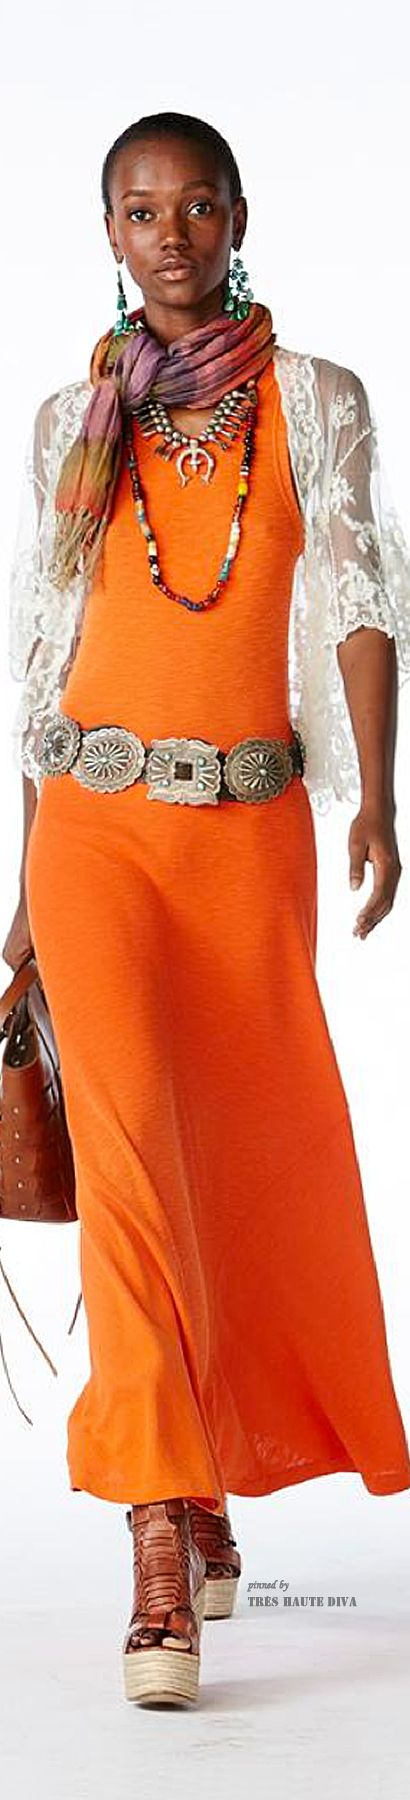 Polo Ralph Lauren Spring/Summer 2015 Ready-To-Wear